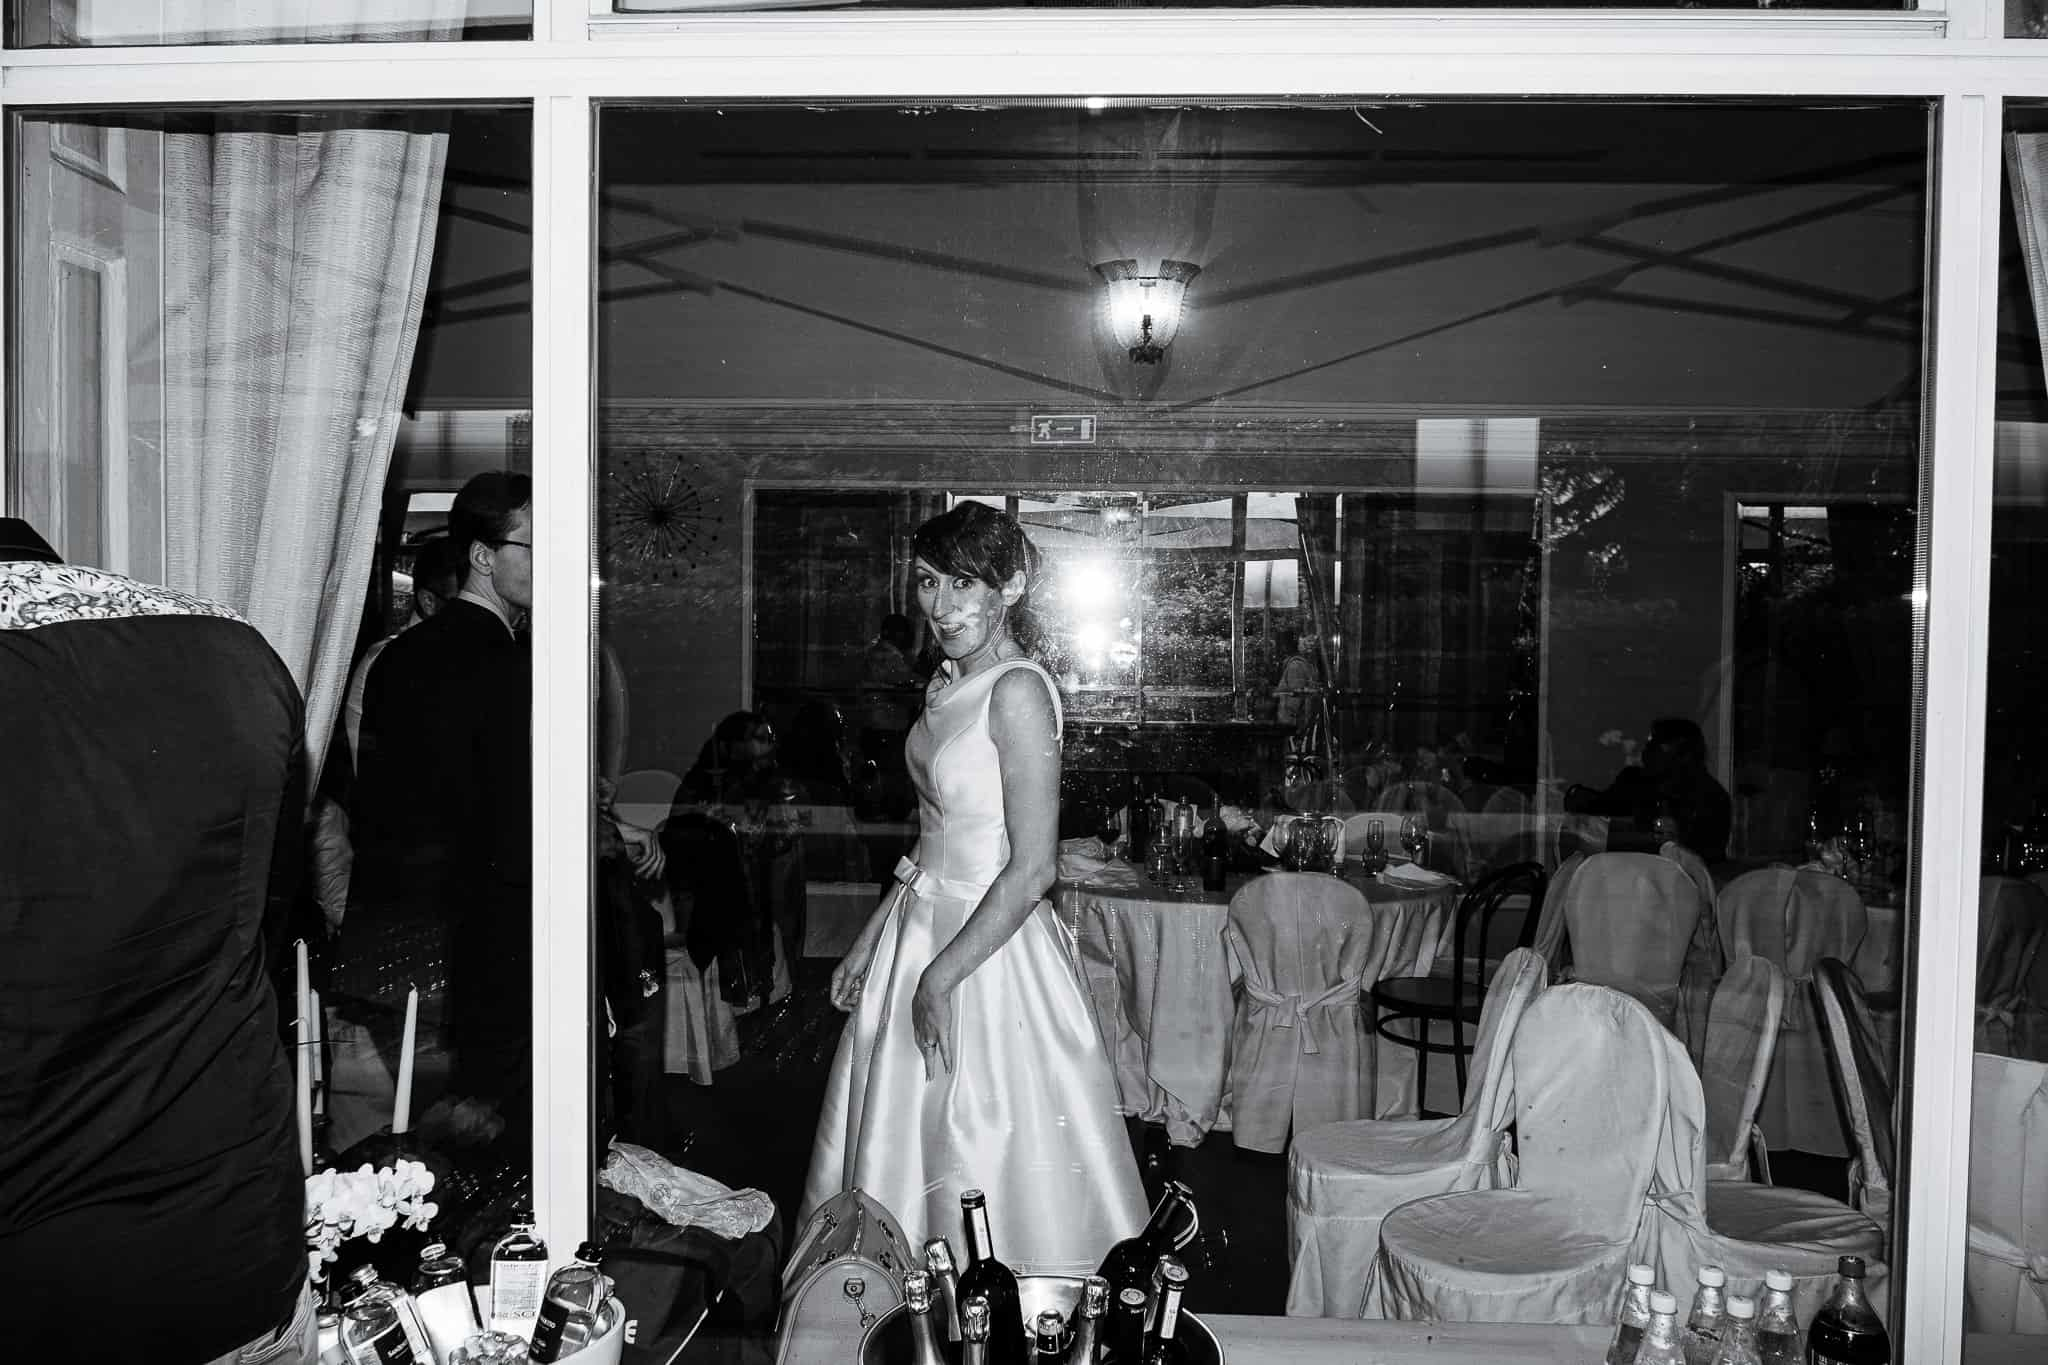 matrimonio Canter Milano San siro Luca rossi wedding reportage 0051